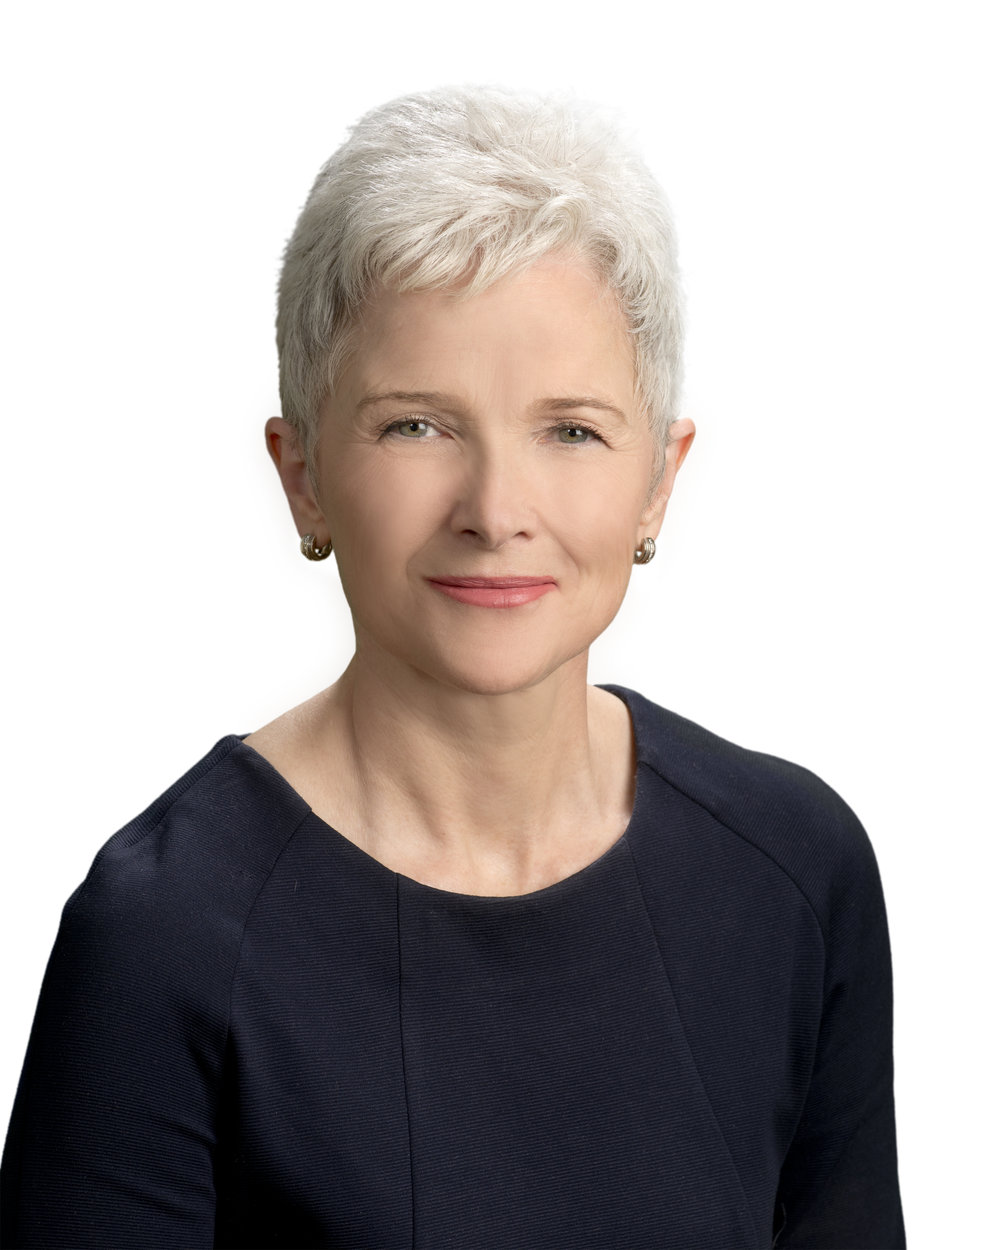 Victoria Watkins, Assistant Dean & Executive Director, Osgoode Hall Law School